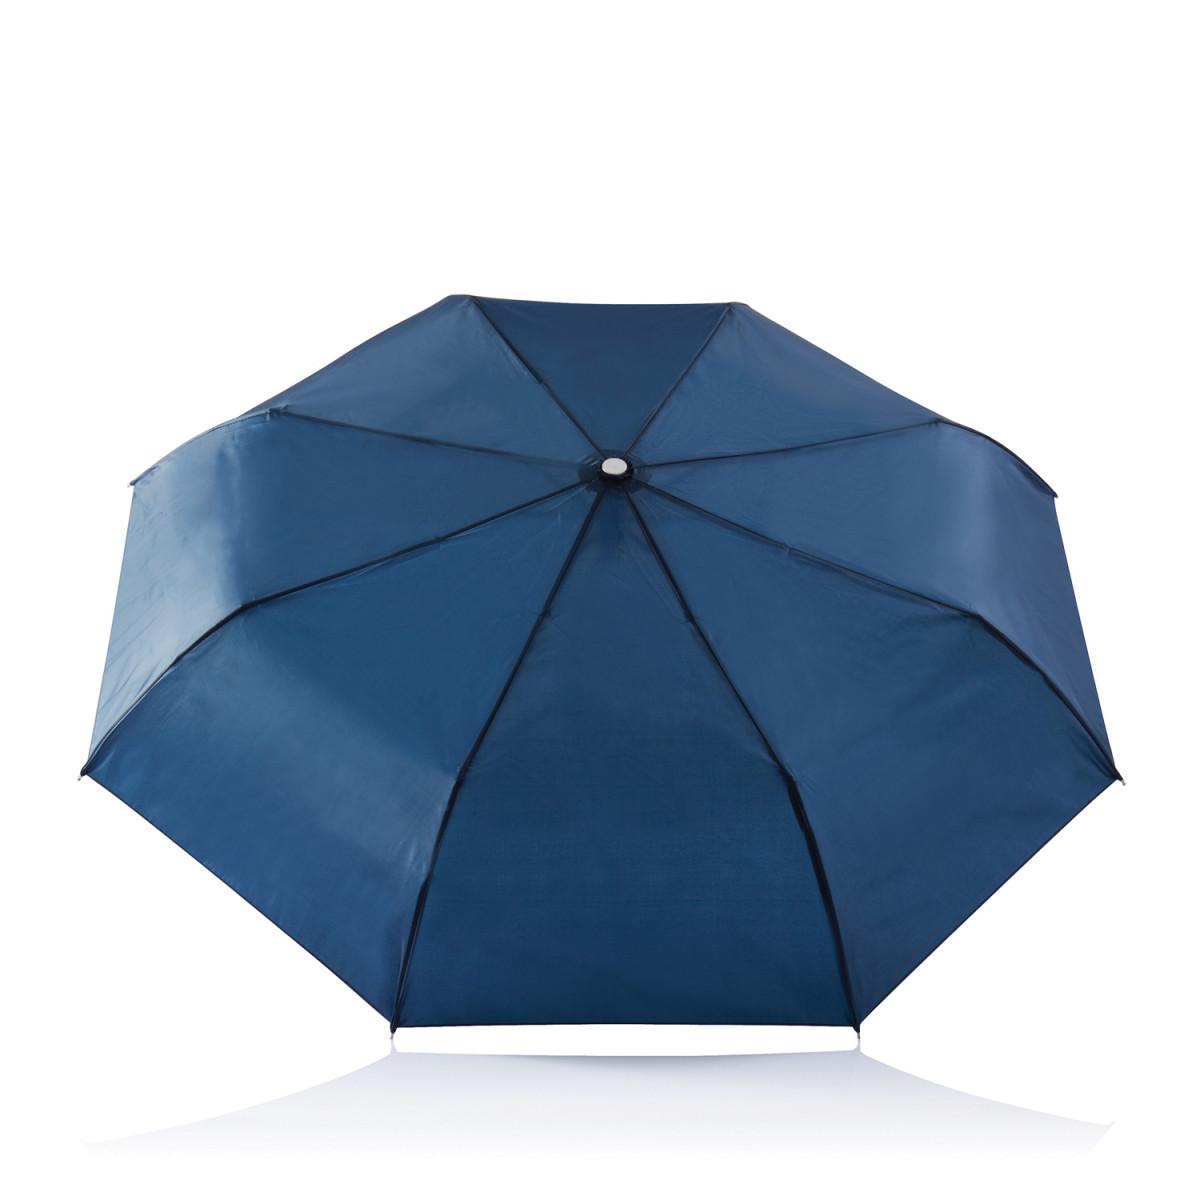 Складной зонт-автомат Deluxe 21,5,темно-синий